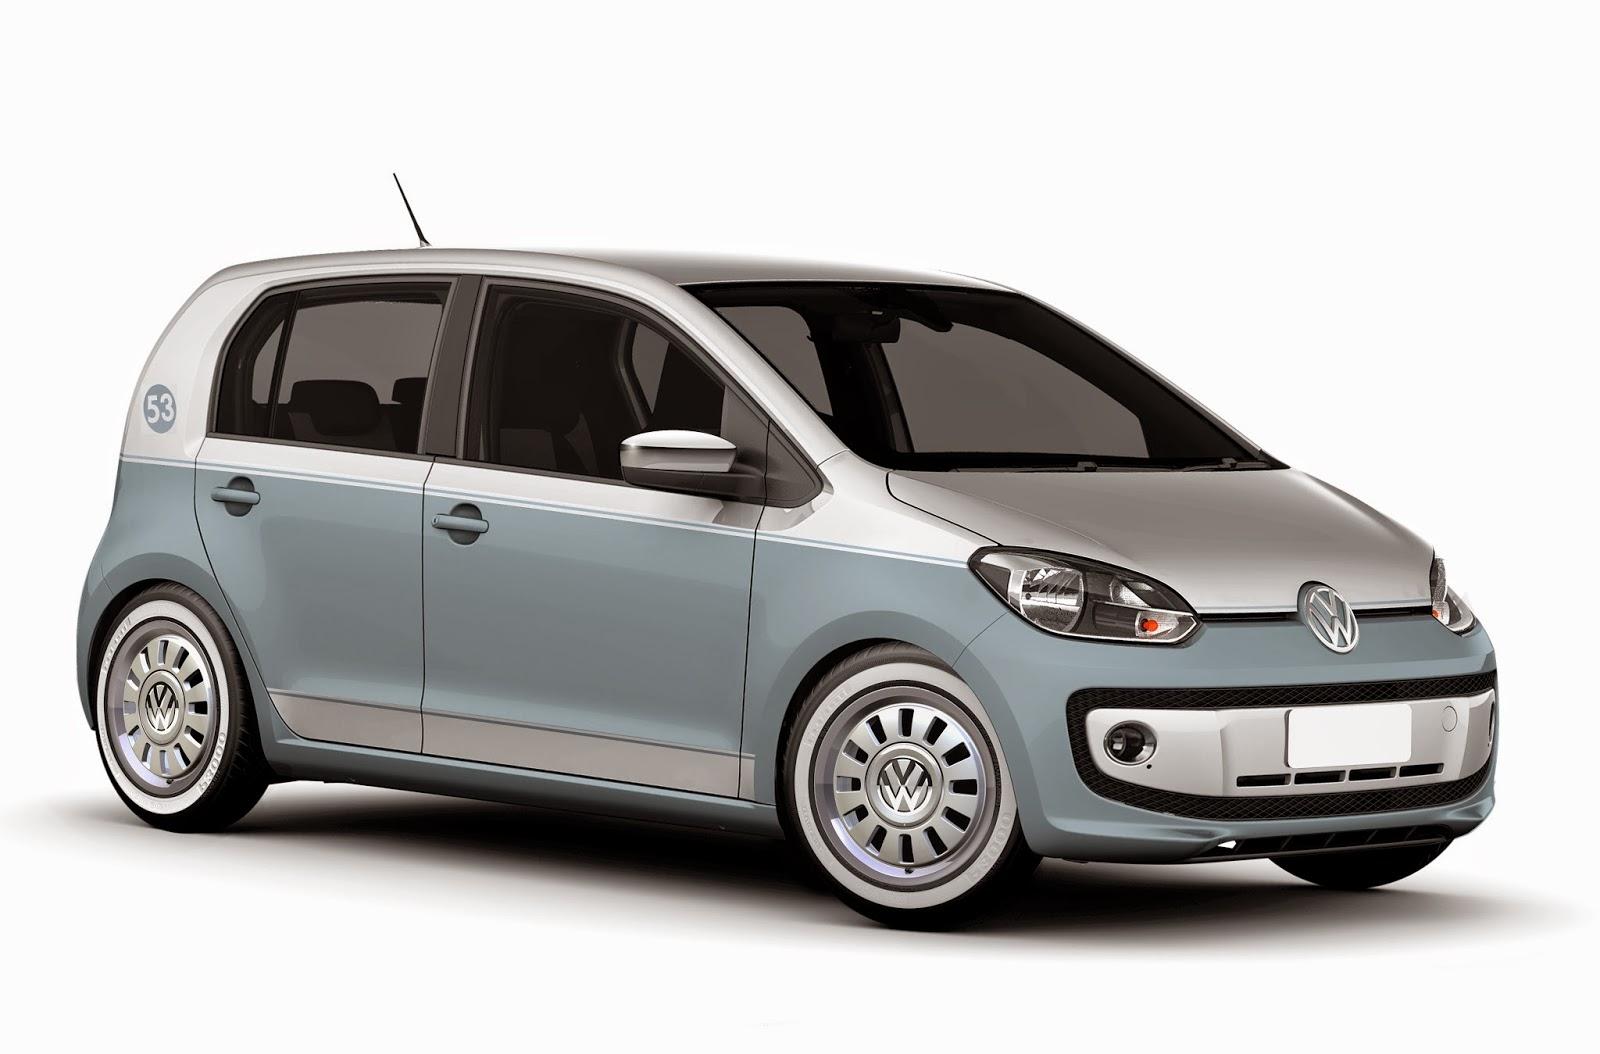 Volkswagen Up - www.phenomveiculos.com.br